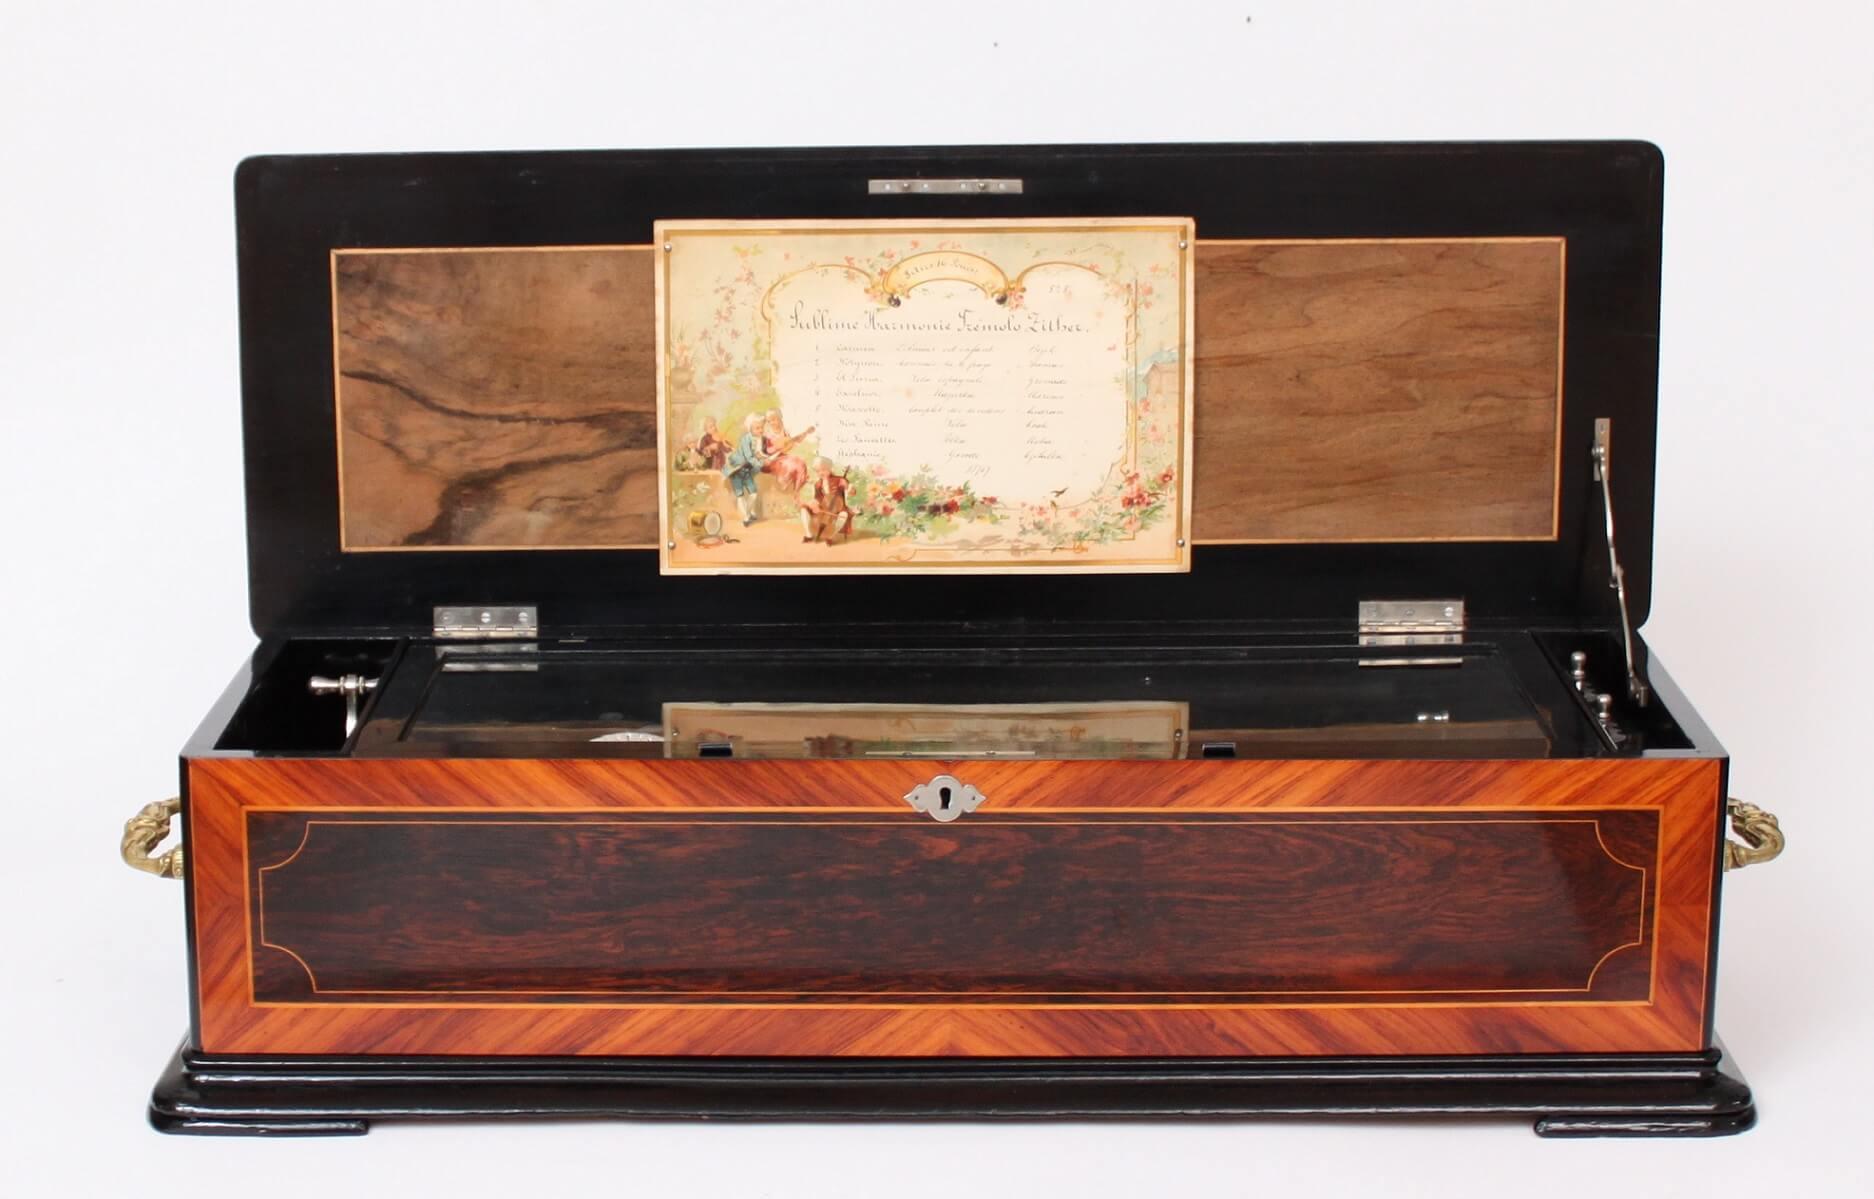 Swiss-Paillard-PVF-Geneva-rosewood-musical-mechanical-music-sublime-harmony-tremolo-zither-cylinder-music-box-